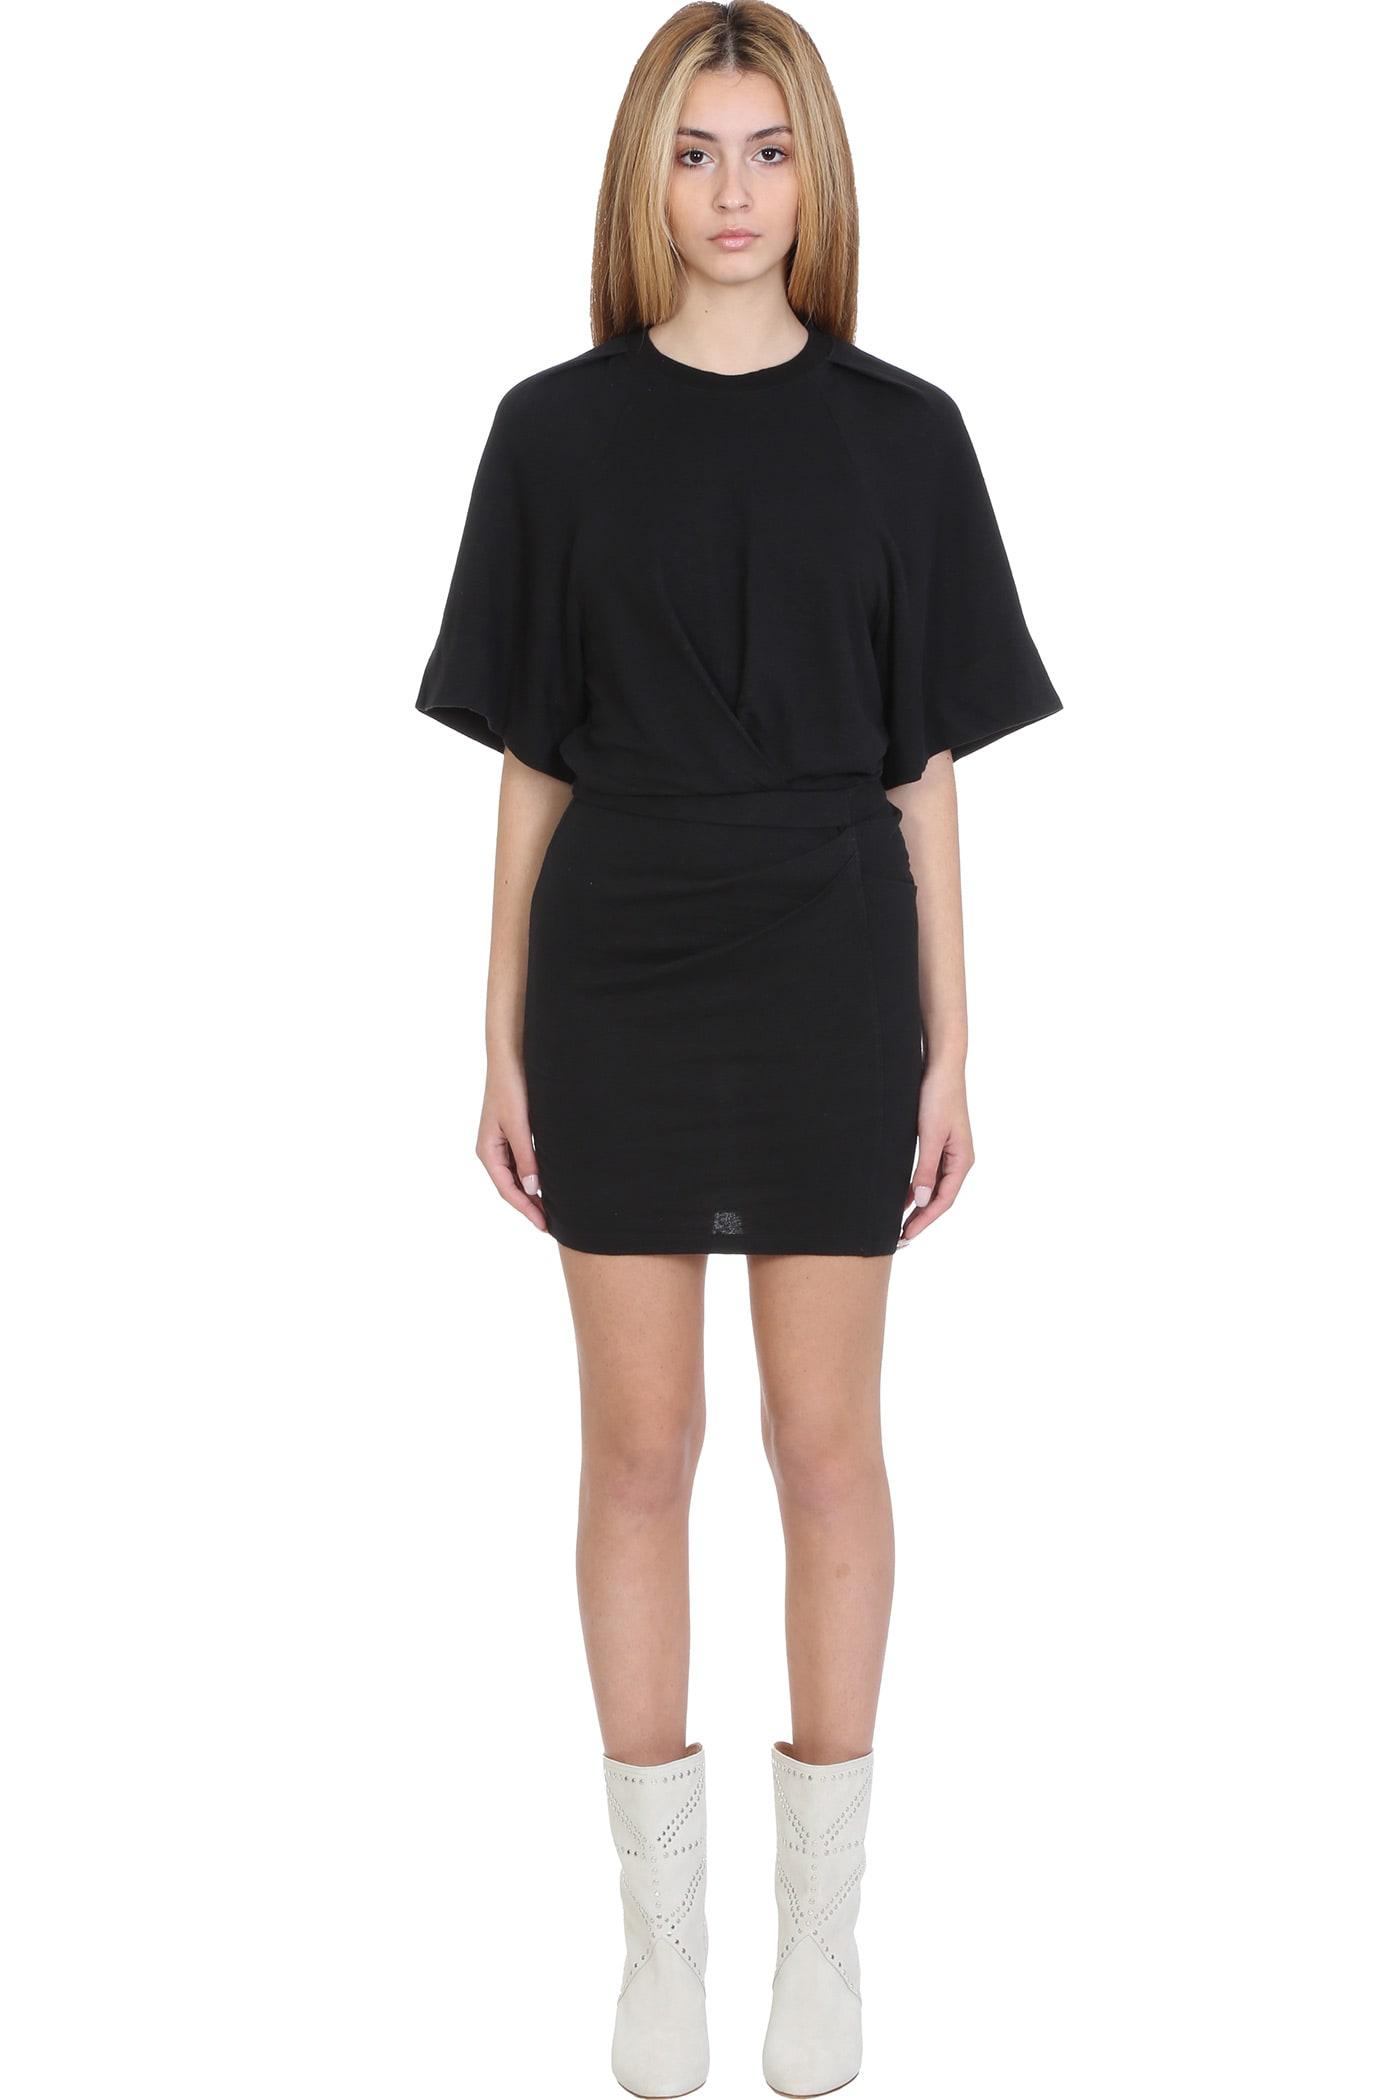 Buy IRO Livy Dress In Black Linen online, shop IRO with free shipping